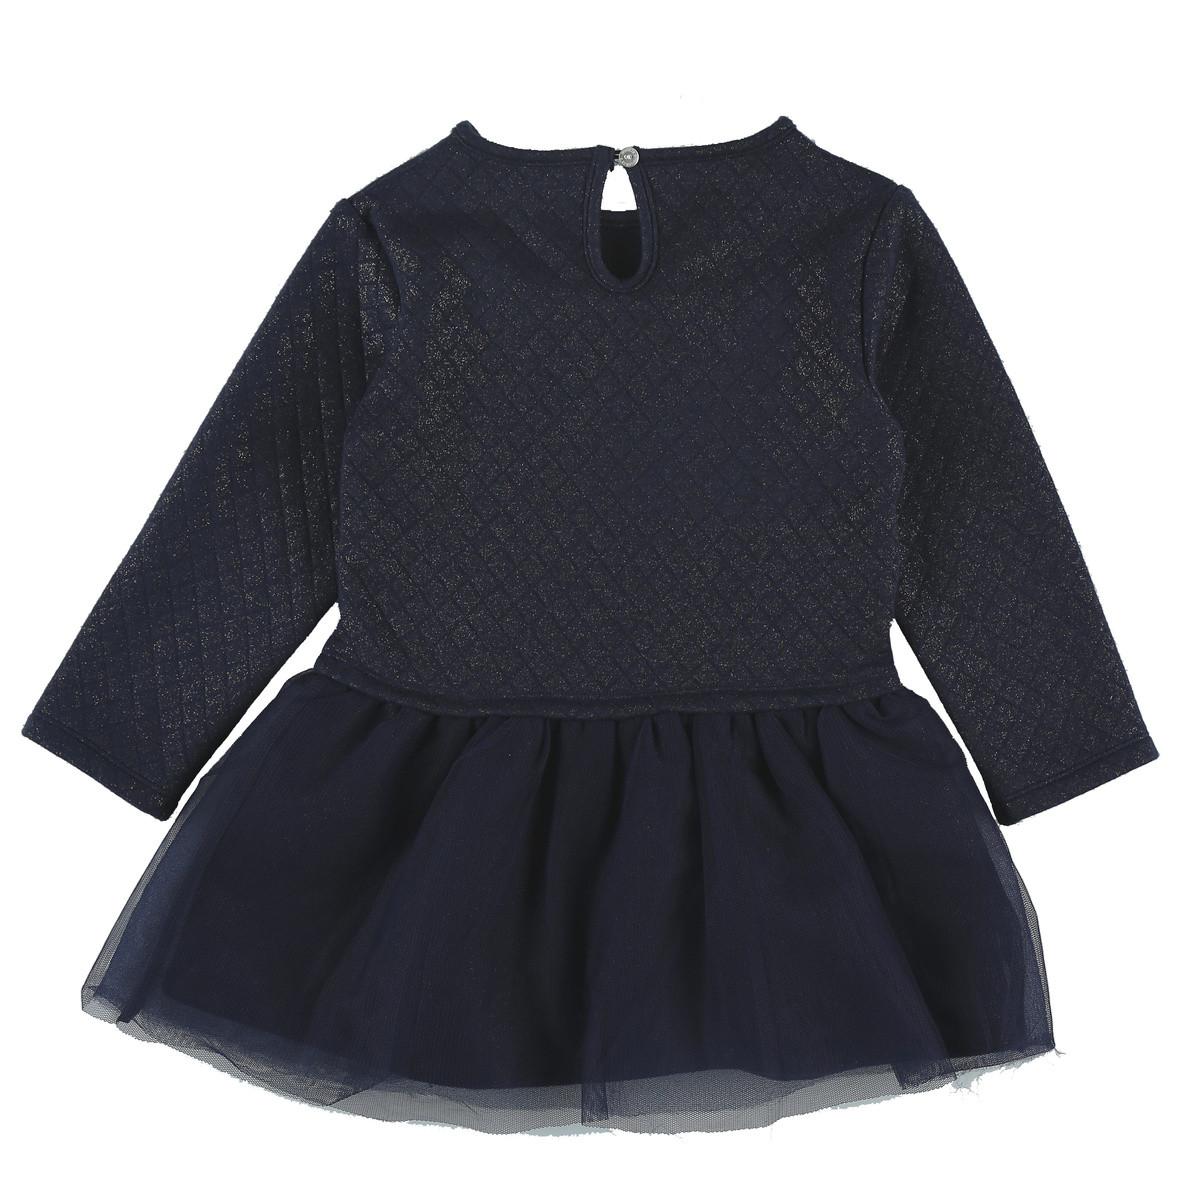 Robe Fille bi-matière en molleton Collection Smart Girl Bleu doré  de Noukies